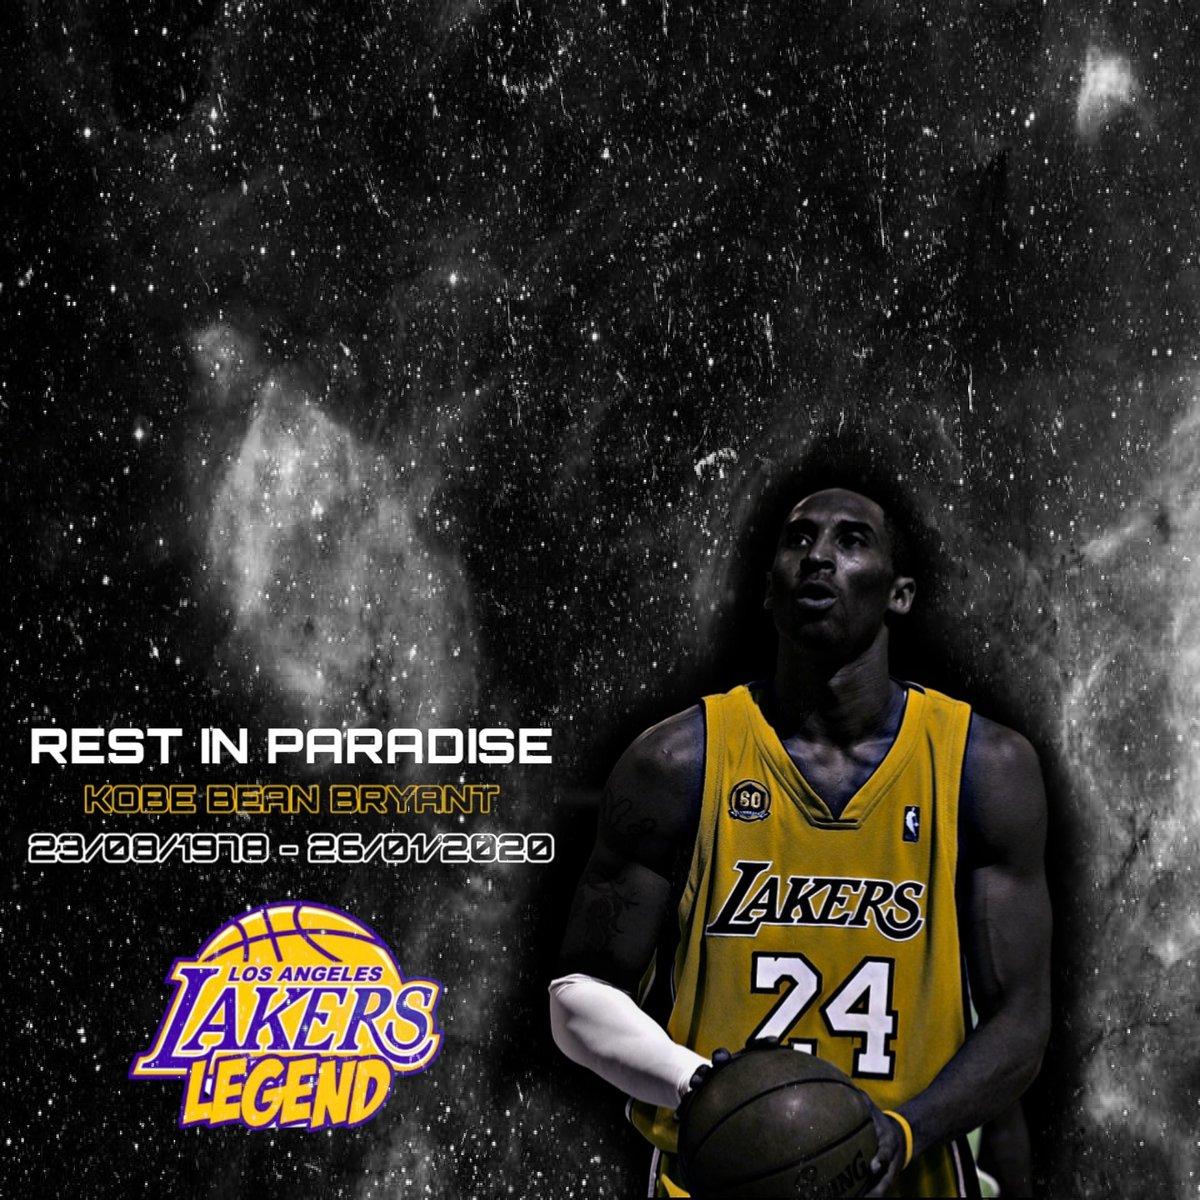 Rest In Paradise @kobebryant @lakers @lakersscene #legend #basketball #lakers #nba #rip #kobebryant #kobe #bryant #basketballedits @granity @drinkbodyarmorpic.twitter.com/DiEGMDRoEx